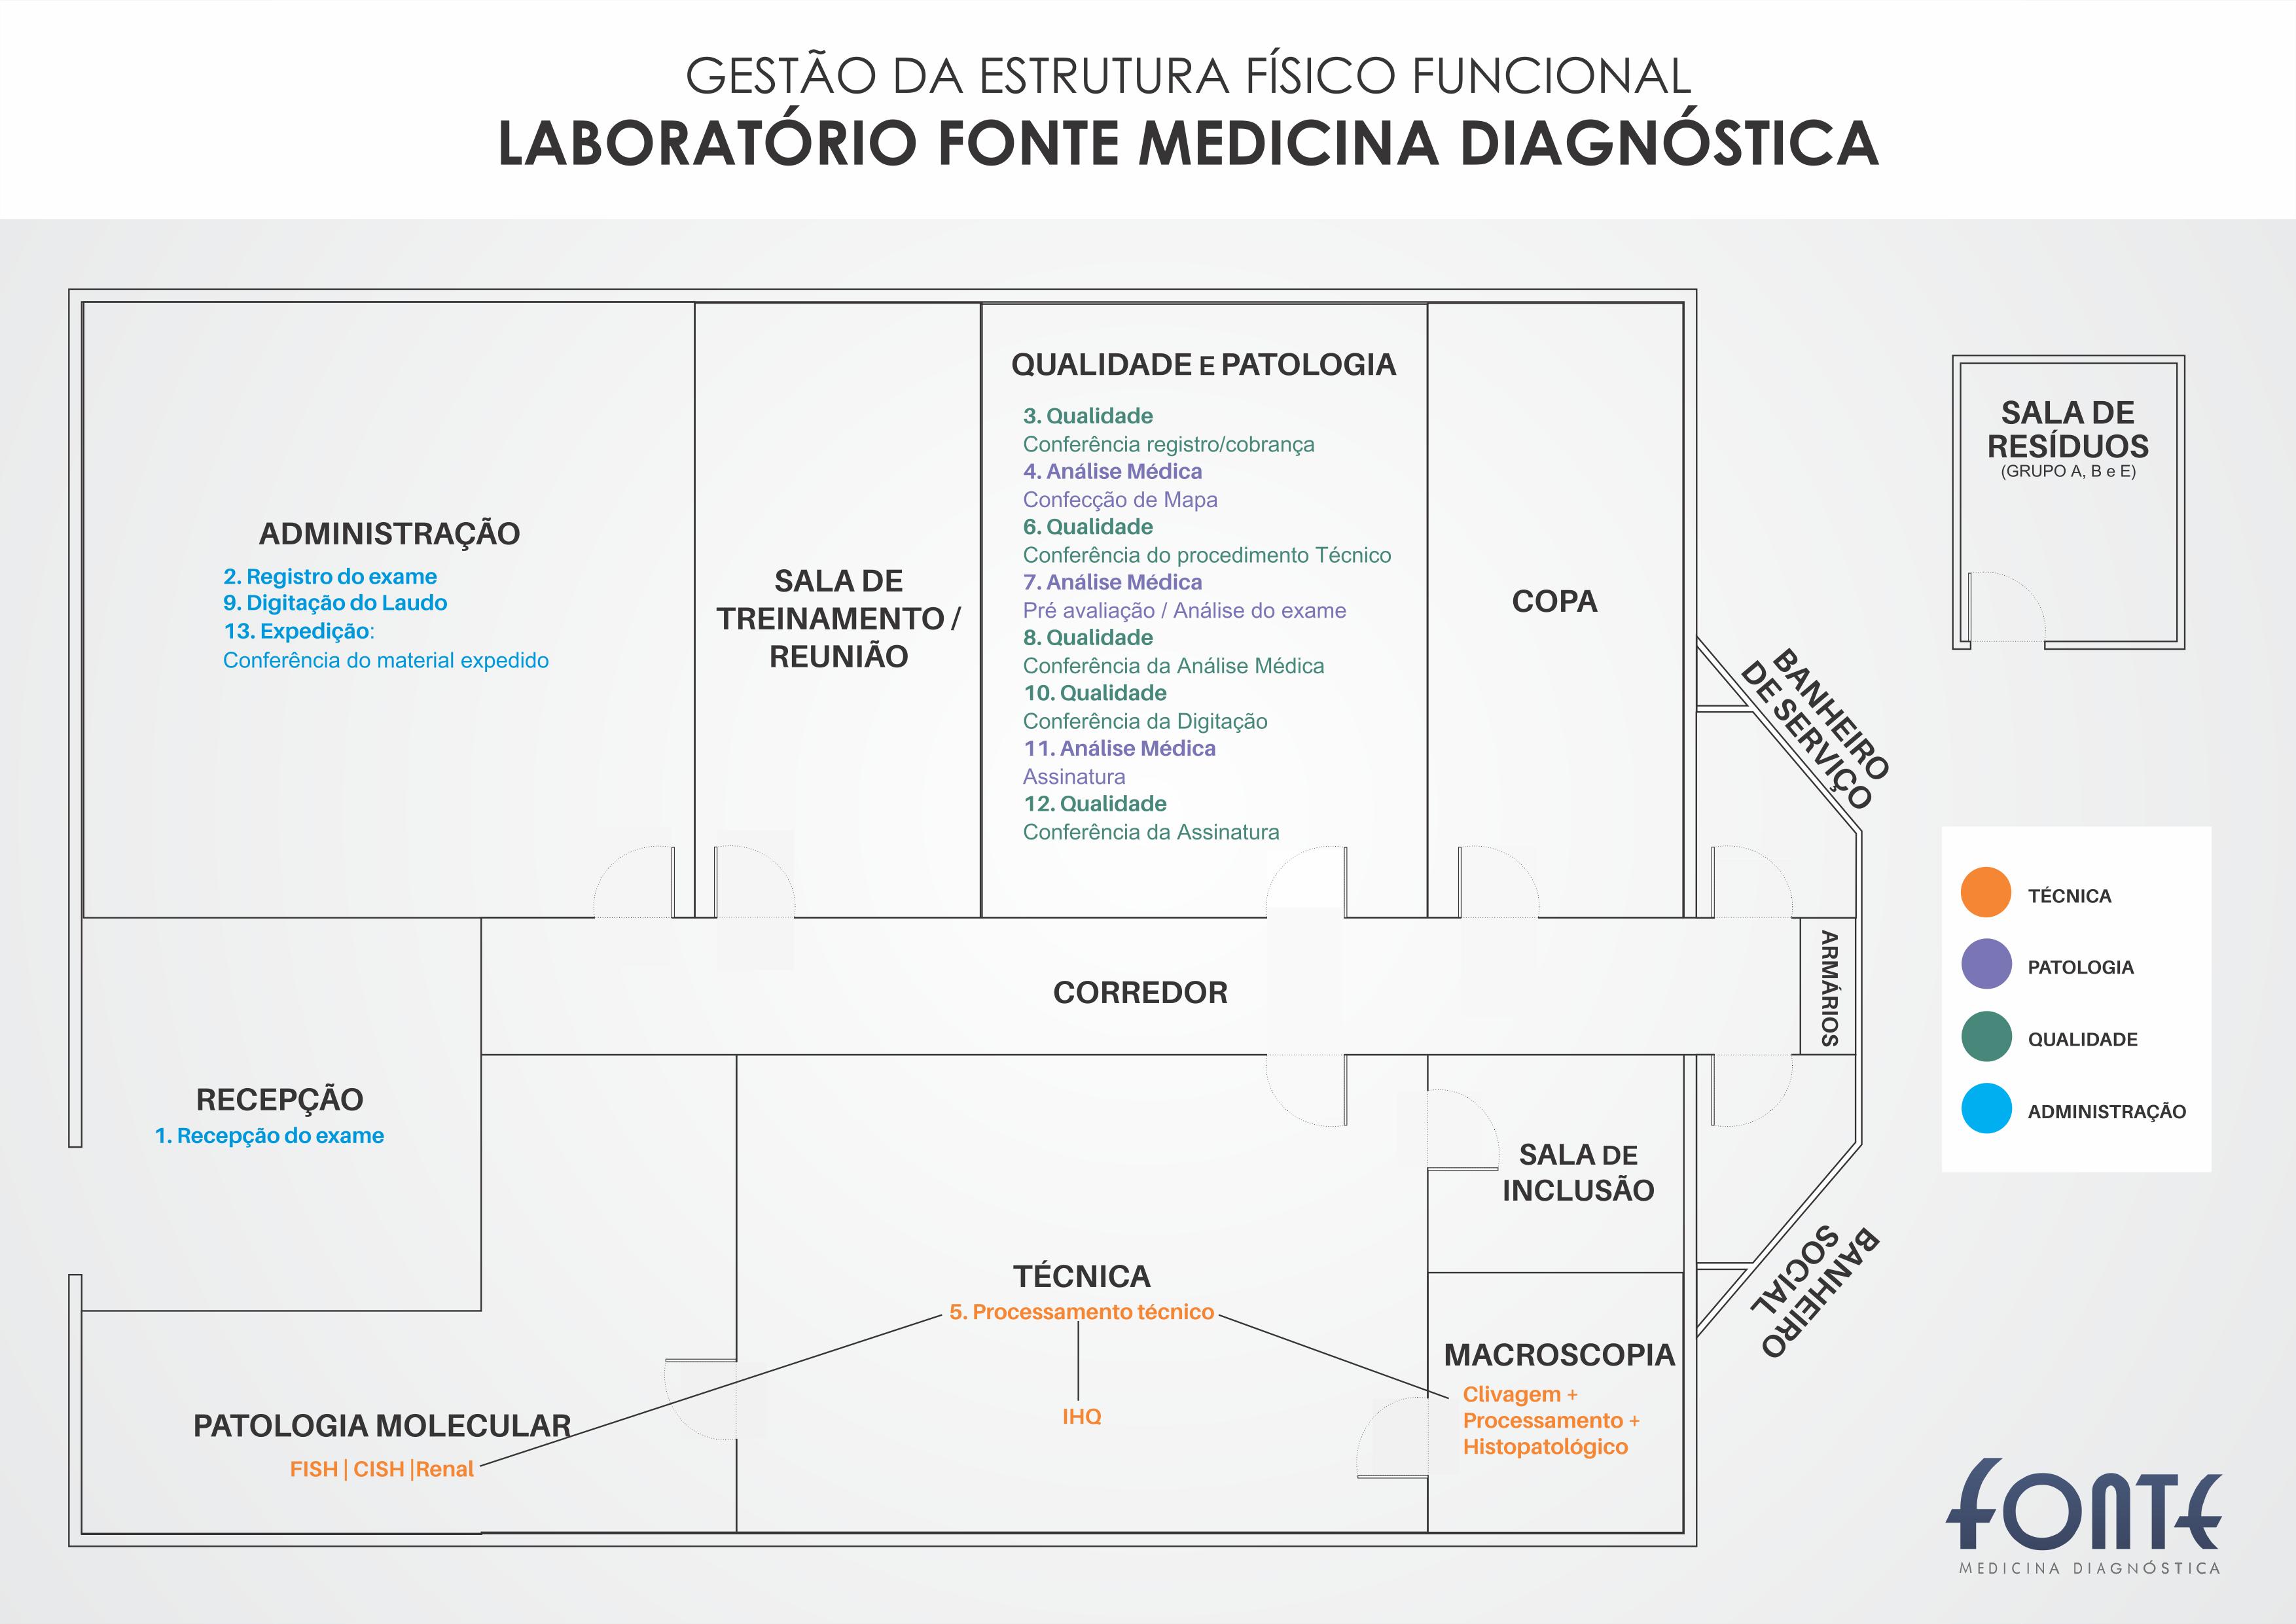 Fonte Medicina Diagnóstica fontemd on Pinterest